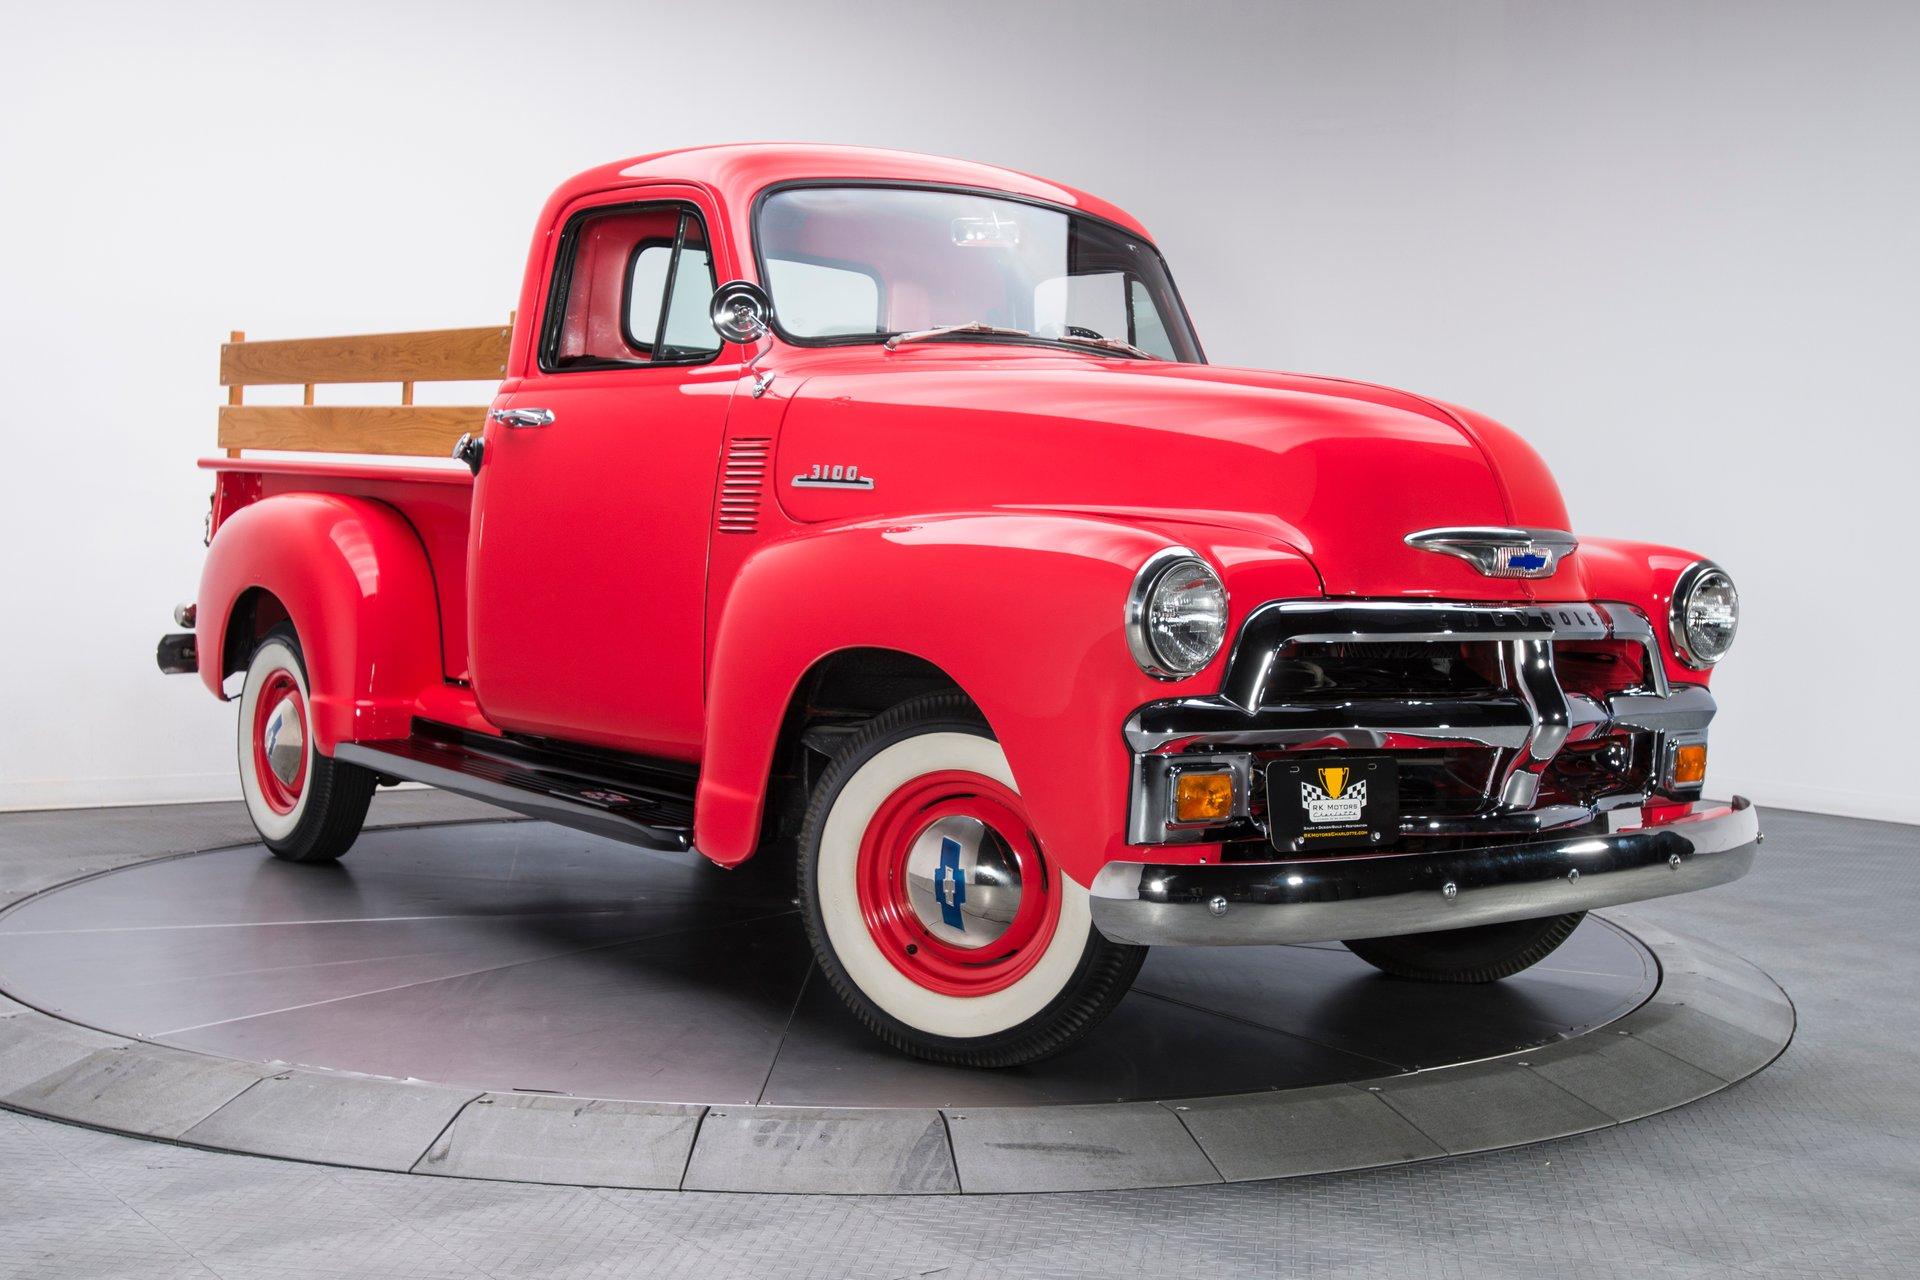 1954 Chevrolet 3100 Pickup Truck Berlin Motors Pick Up For Sale